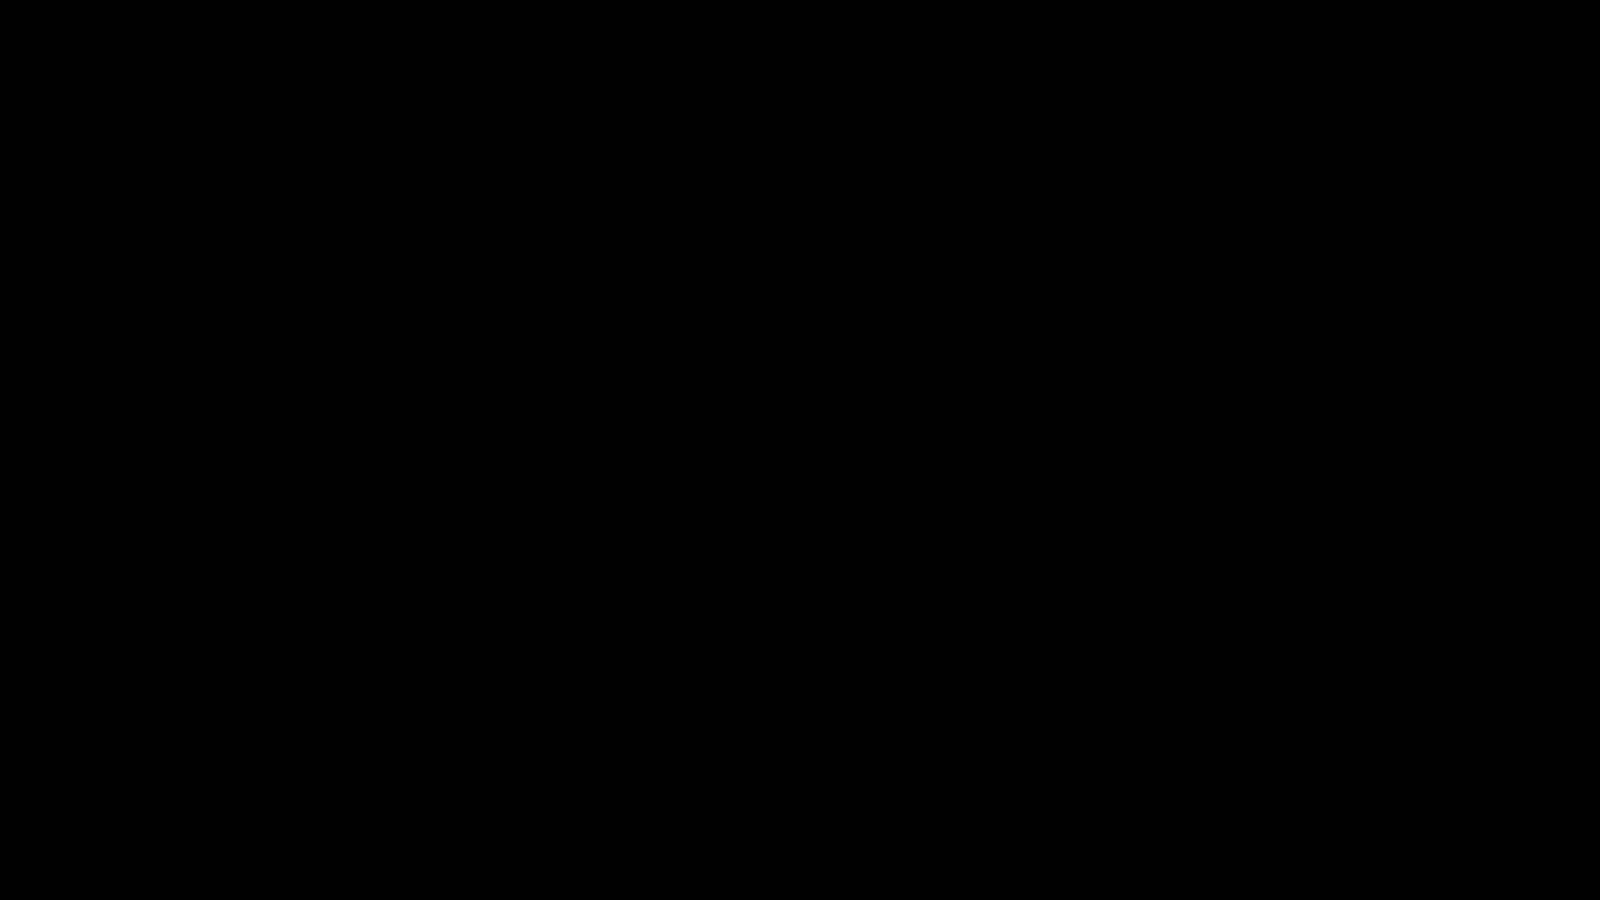 n69zvzql68h5.jpg